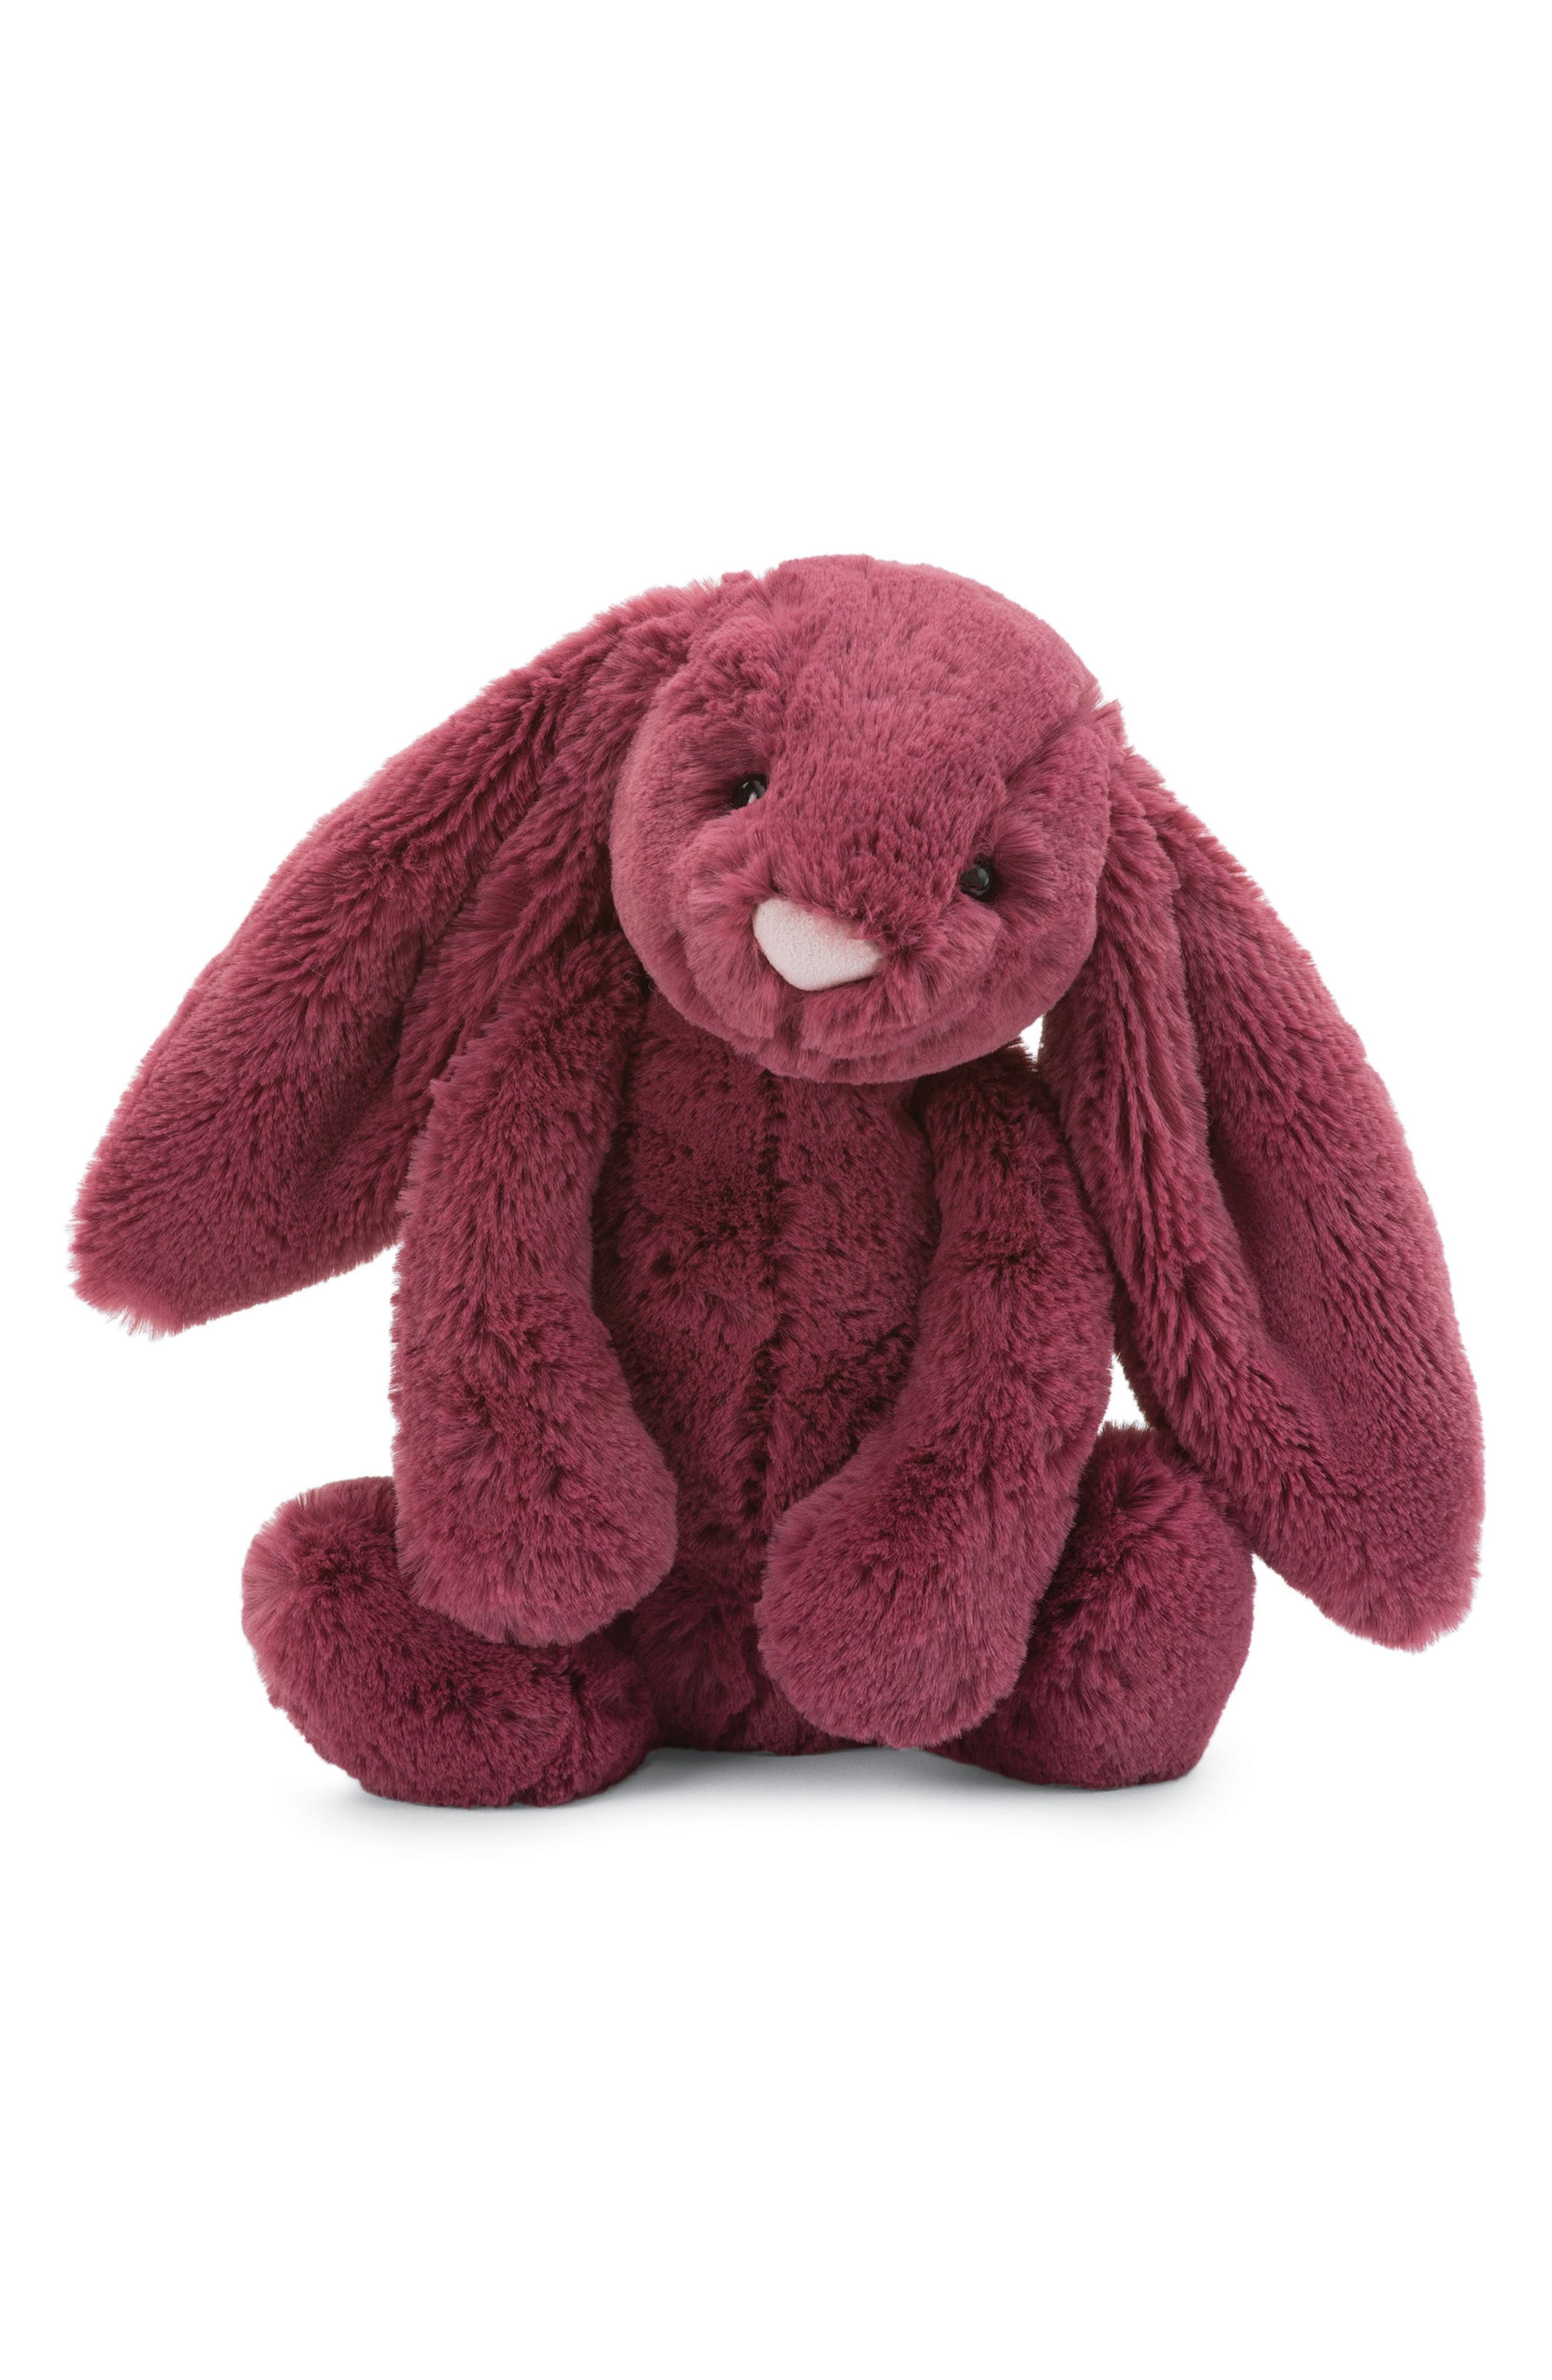 Bashful Berry Bunny Stuffed Animal,                         Main,                         color, 610